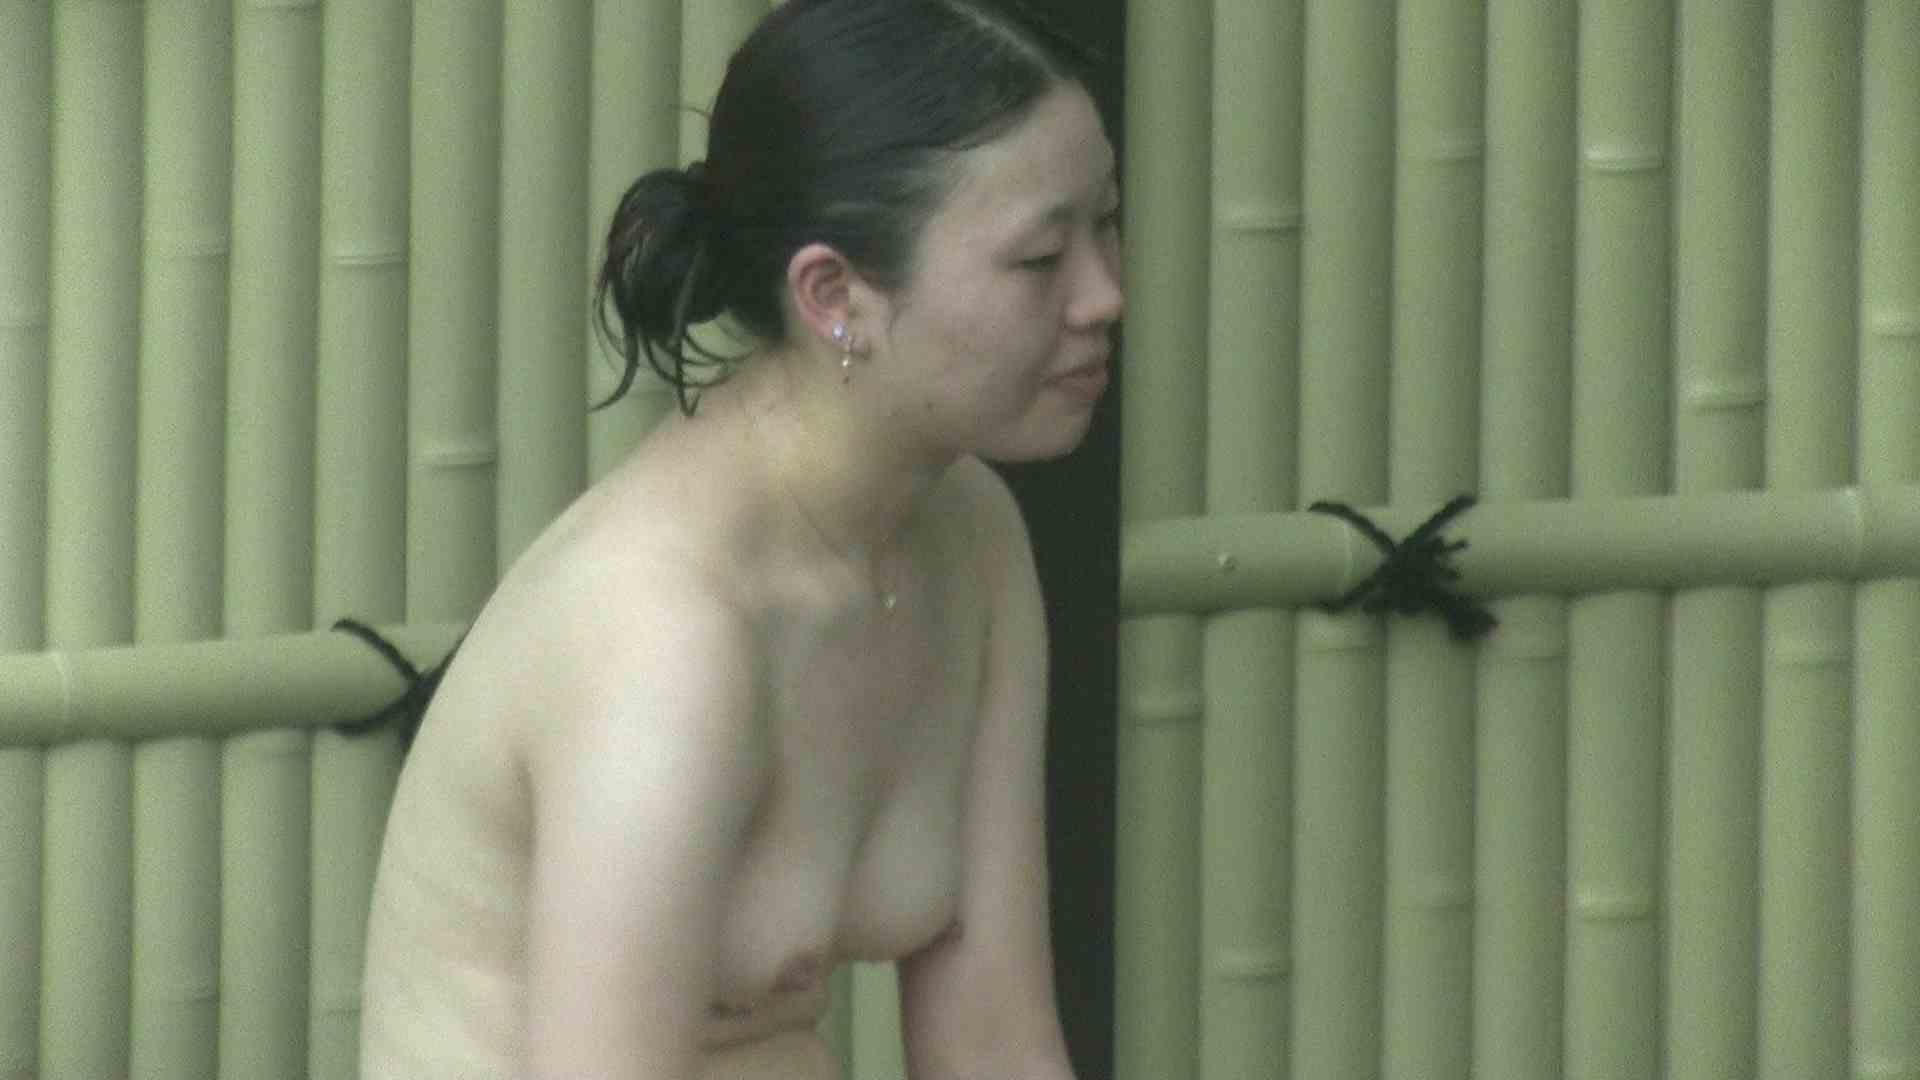 Aquaな露天風呂Vol.194 露天風呂編  110PIX 40